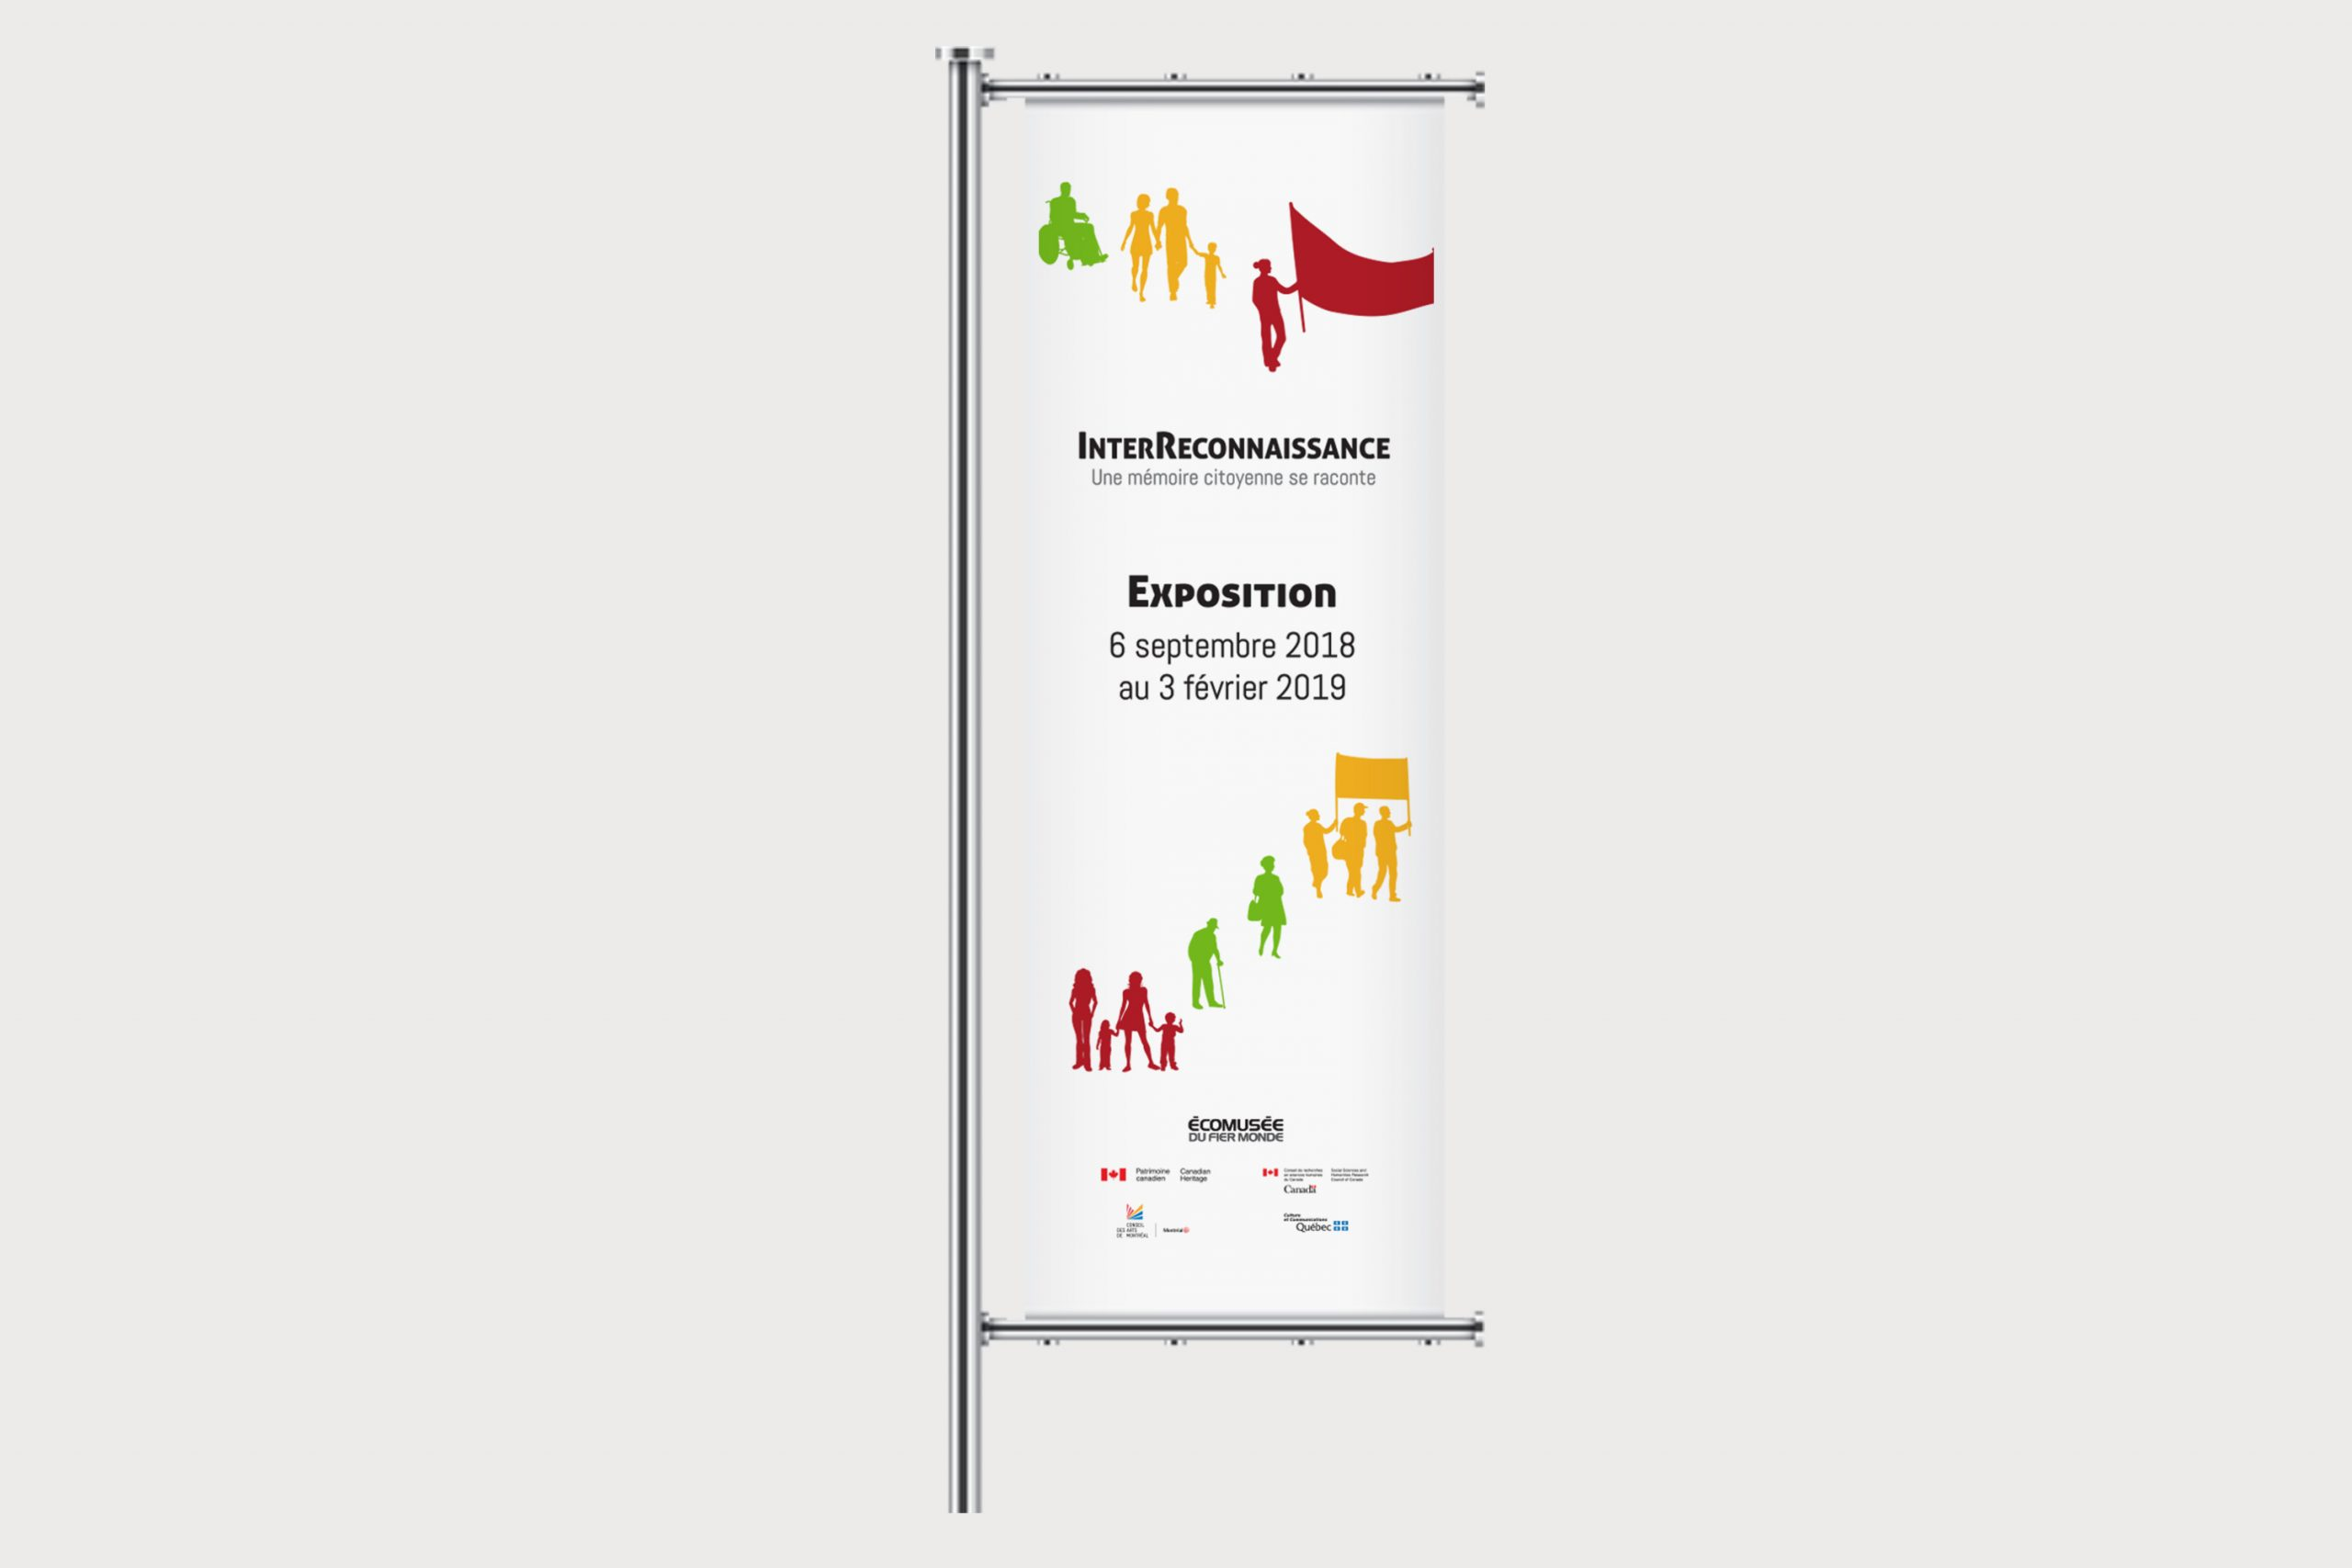 Mailys ORY - Graphiste   Outils promotionnels - InterReconnaissance